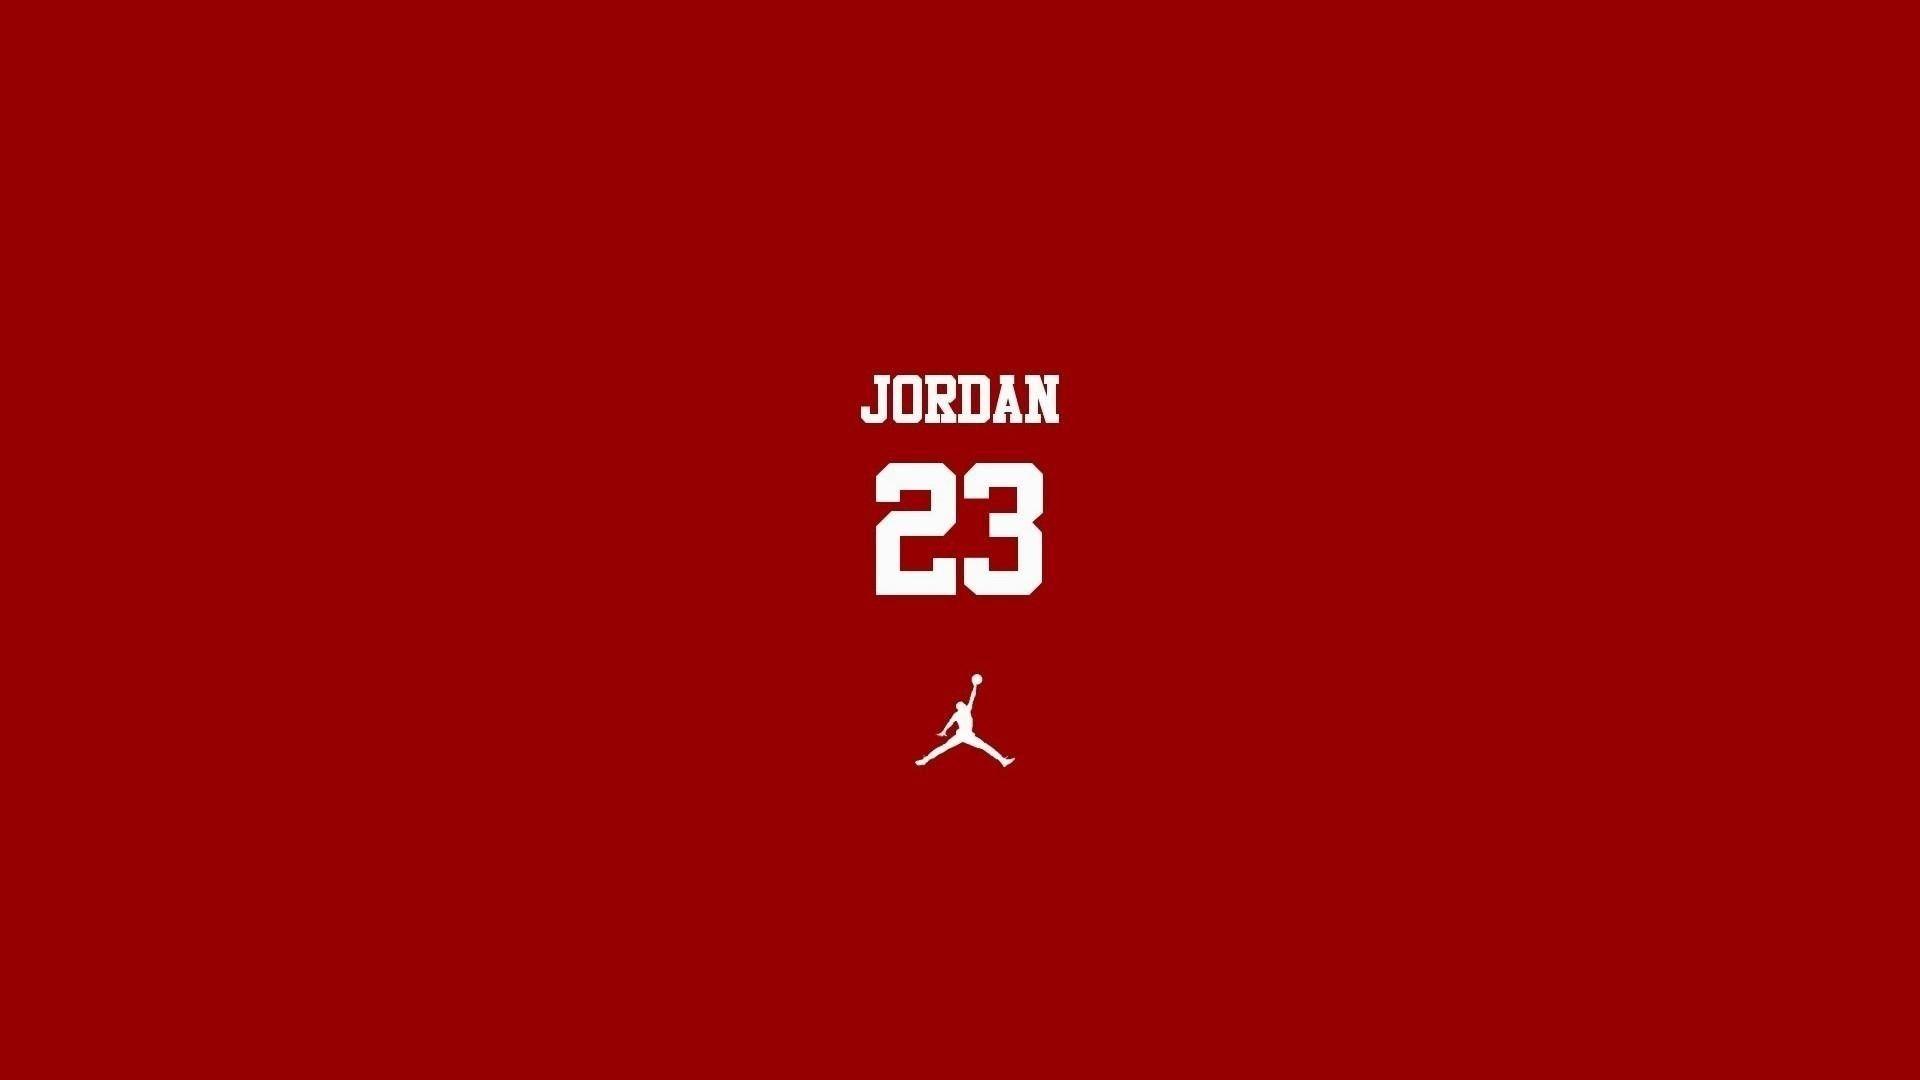 Jordan 23 Pictures